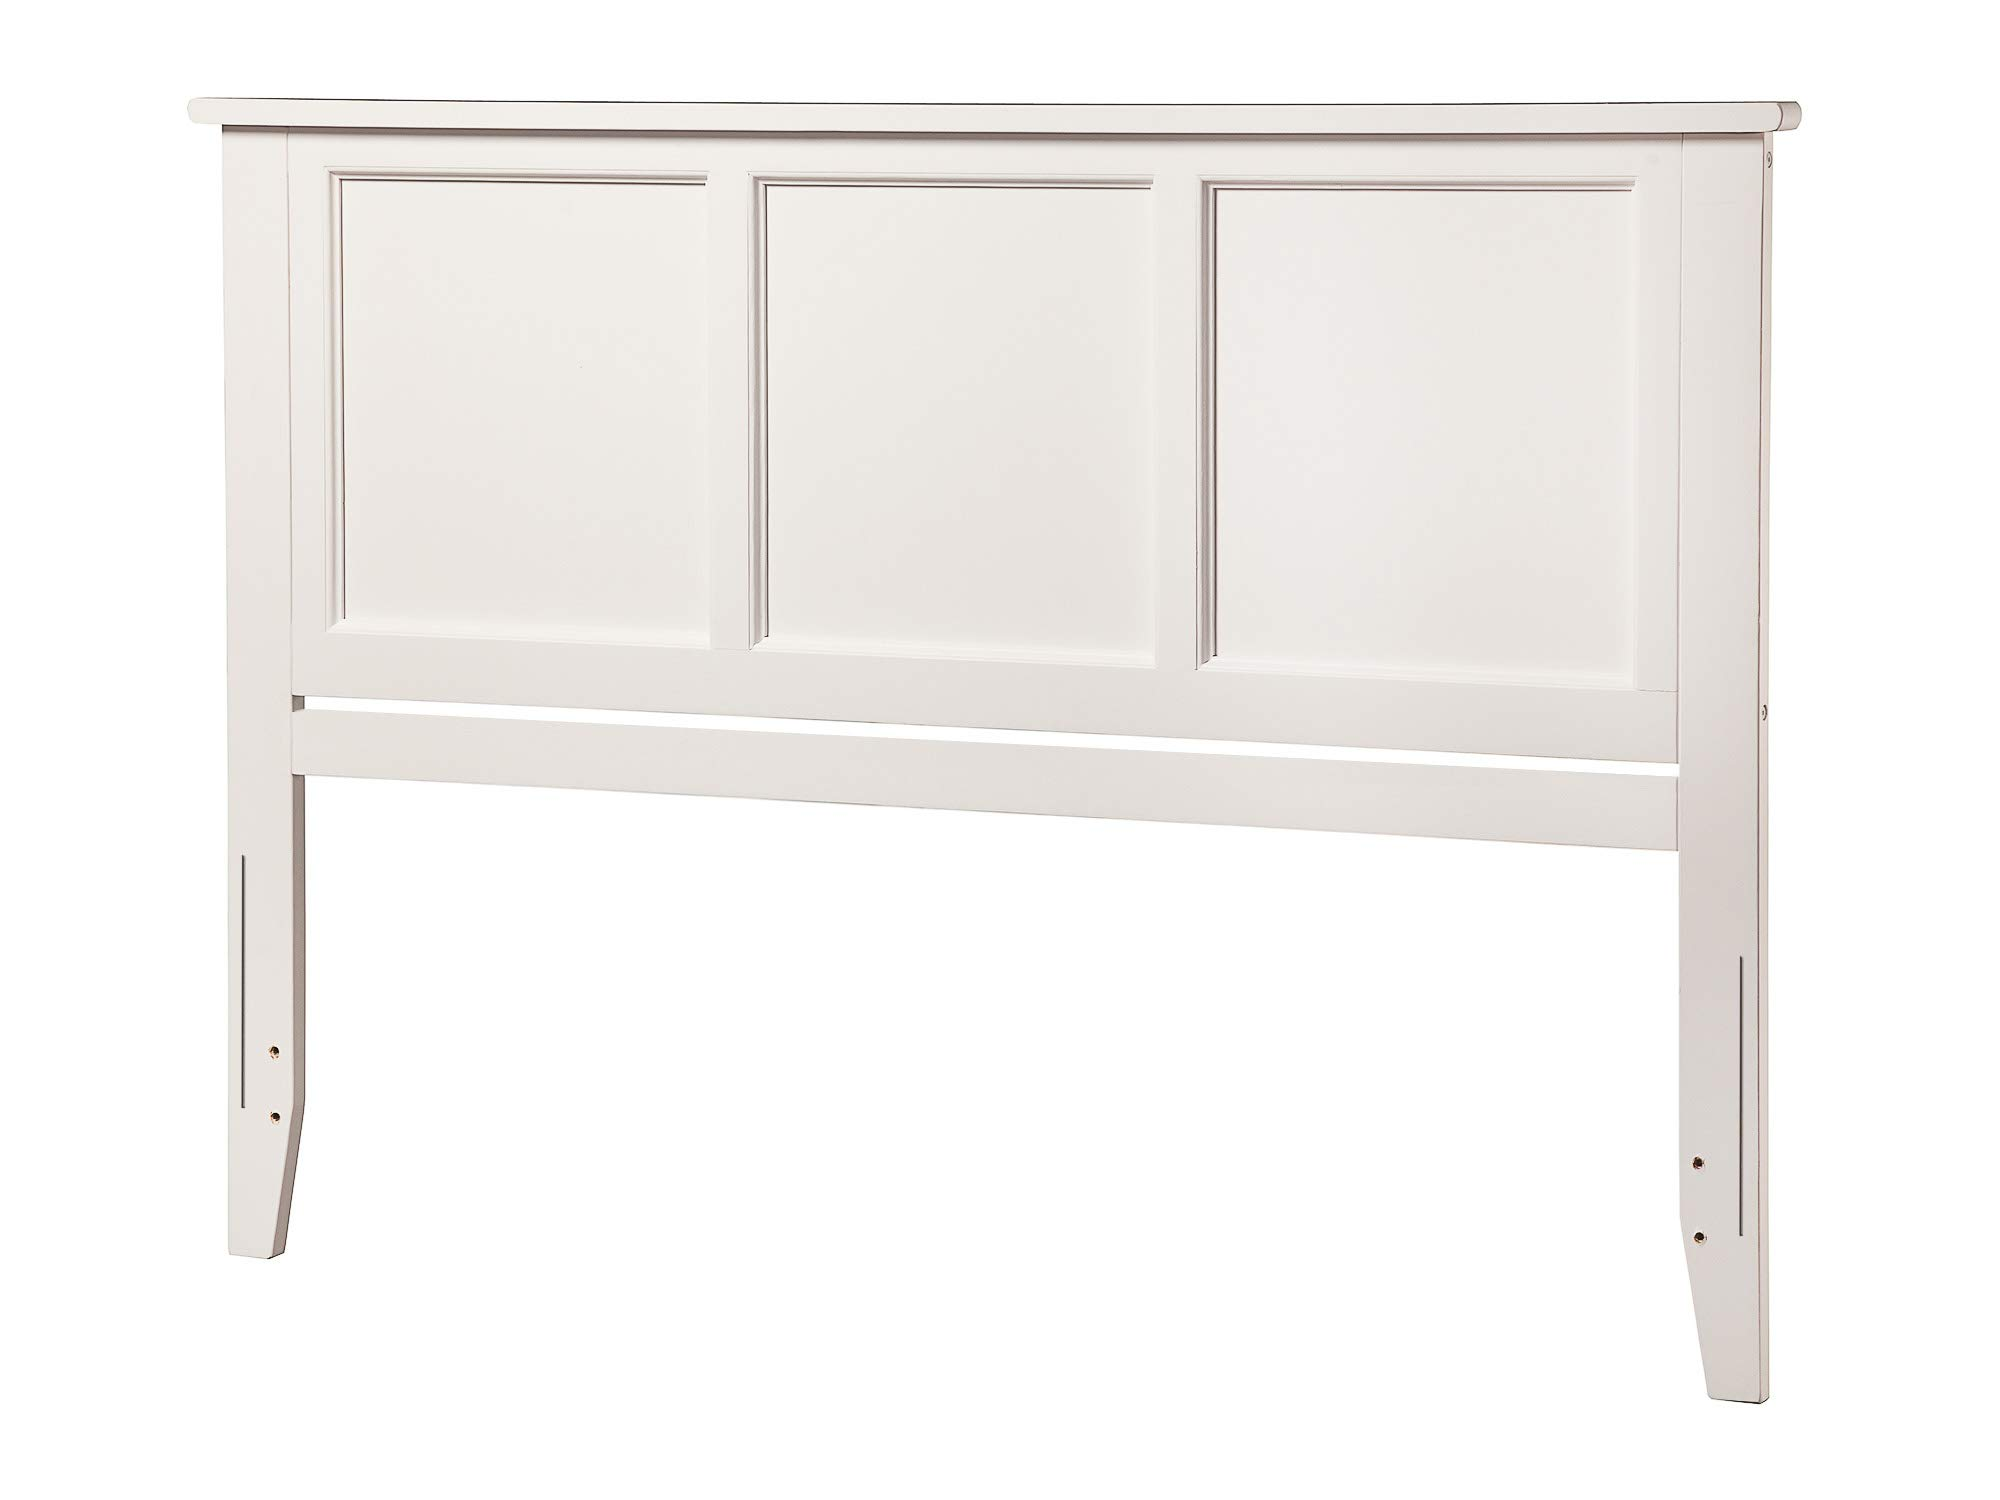 Atlantic Furniture AR286842 Madison Headboard Queen White